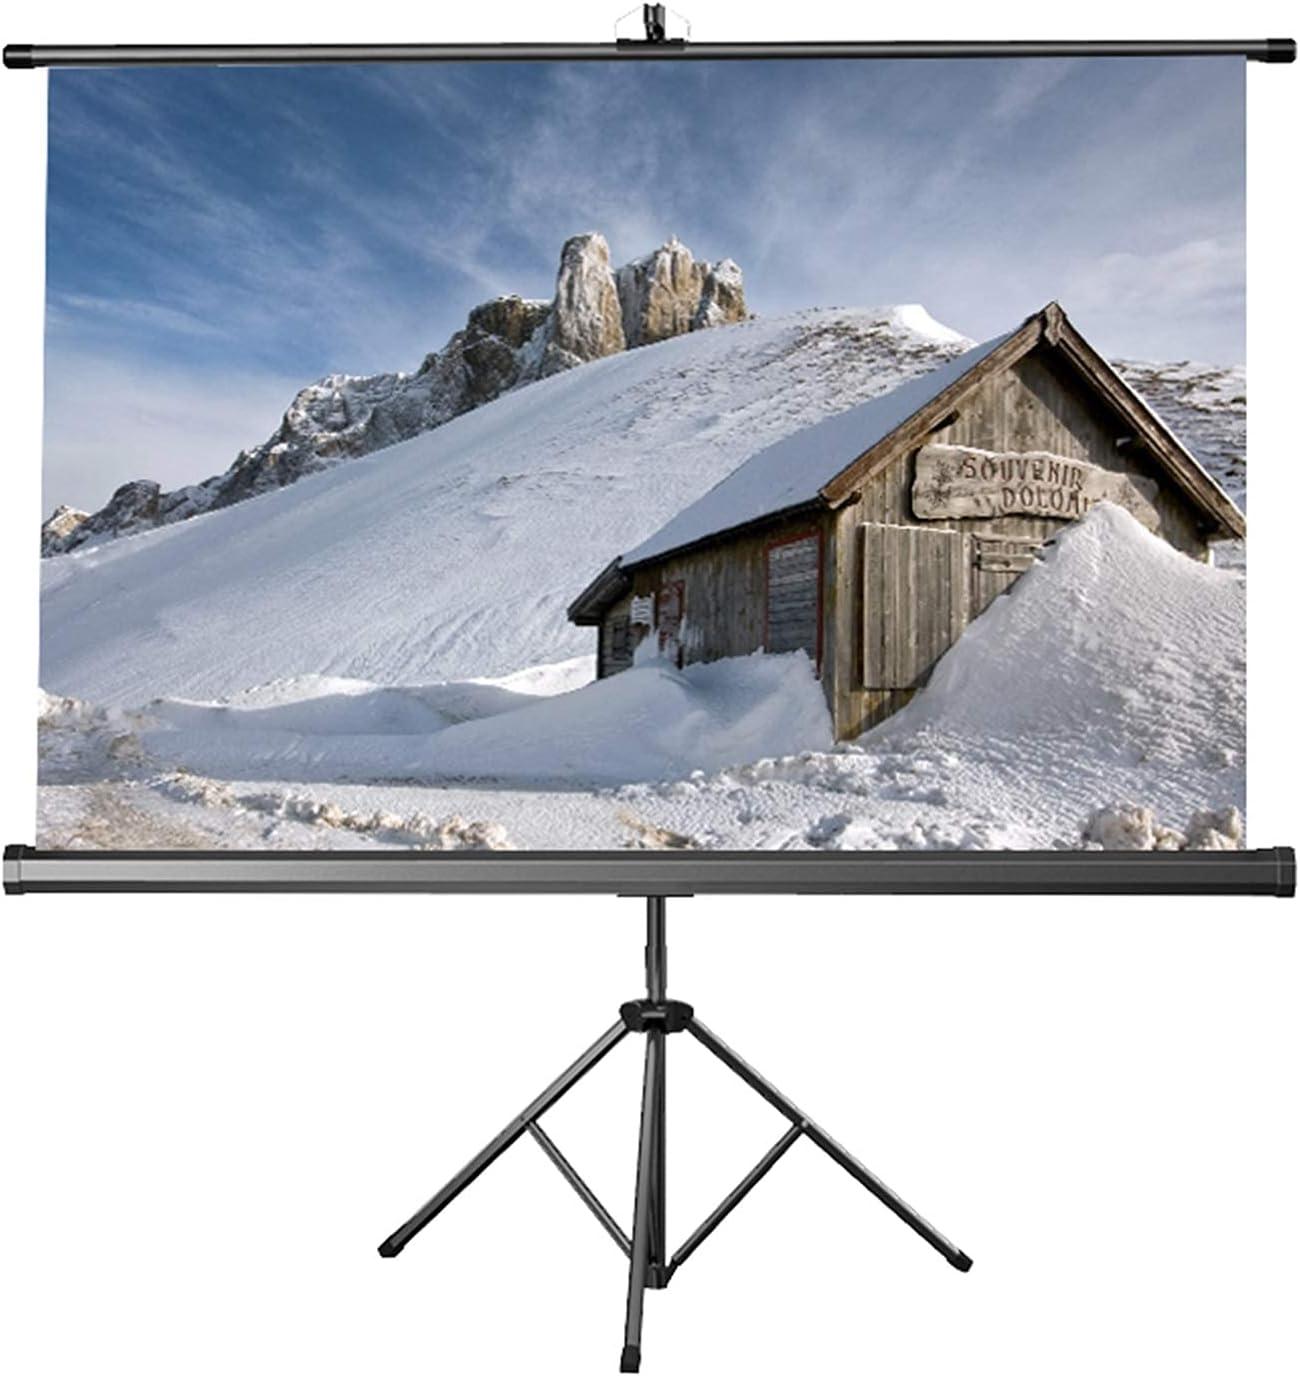 FMOGE Projector Screen with Stand 60 inch, Premium Waterproof Projection Screen for Indoor Outdoor Cinema Durable Movie Screens 4:3/16:10/16:9